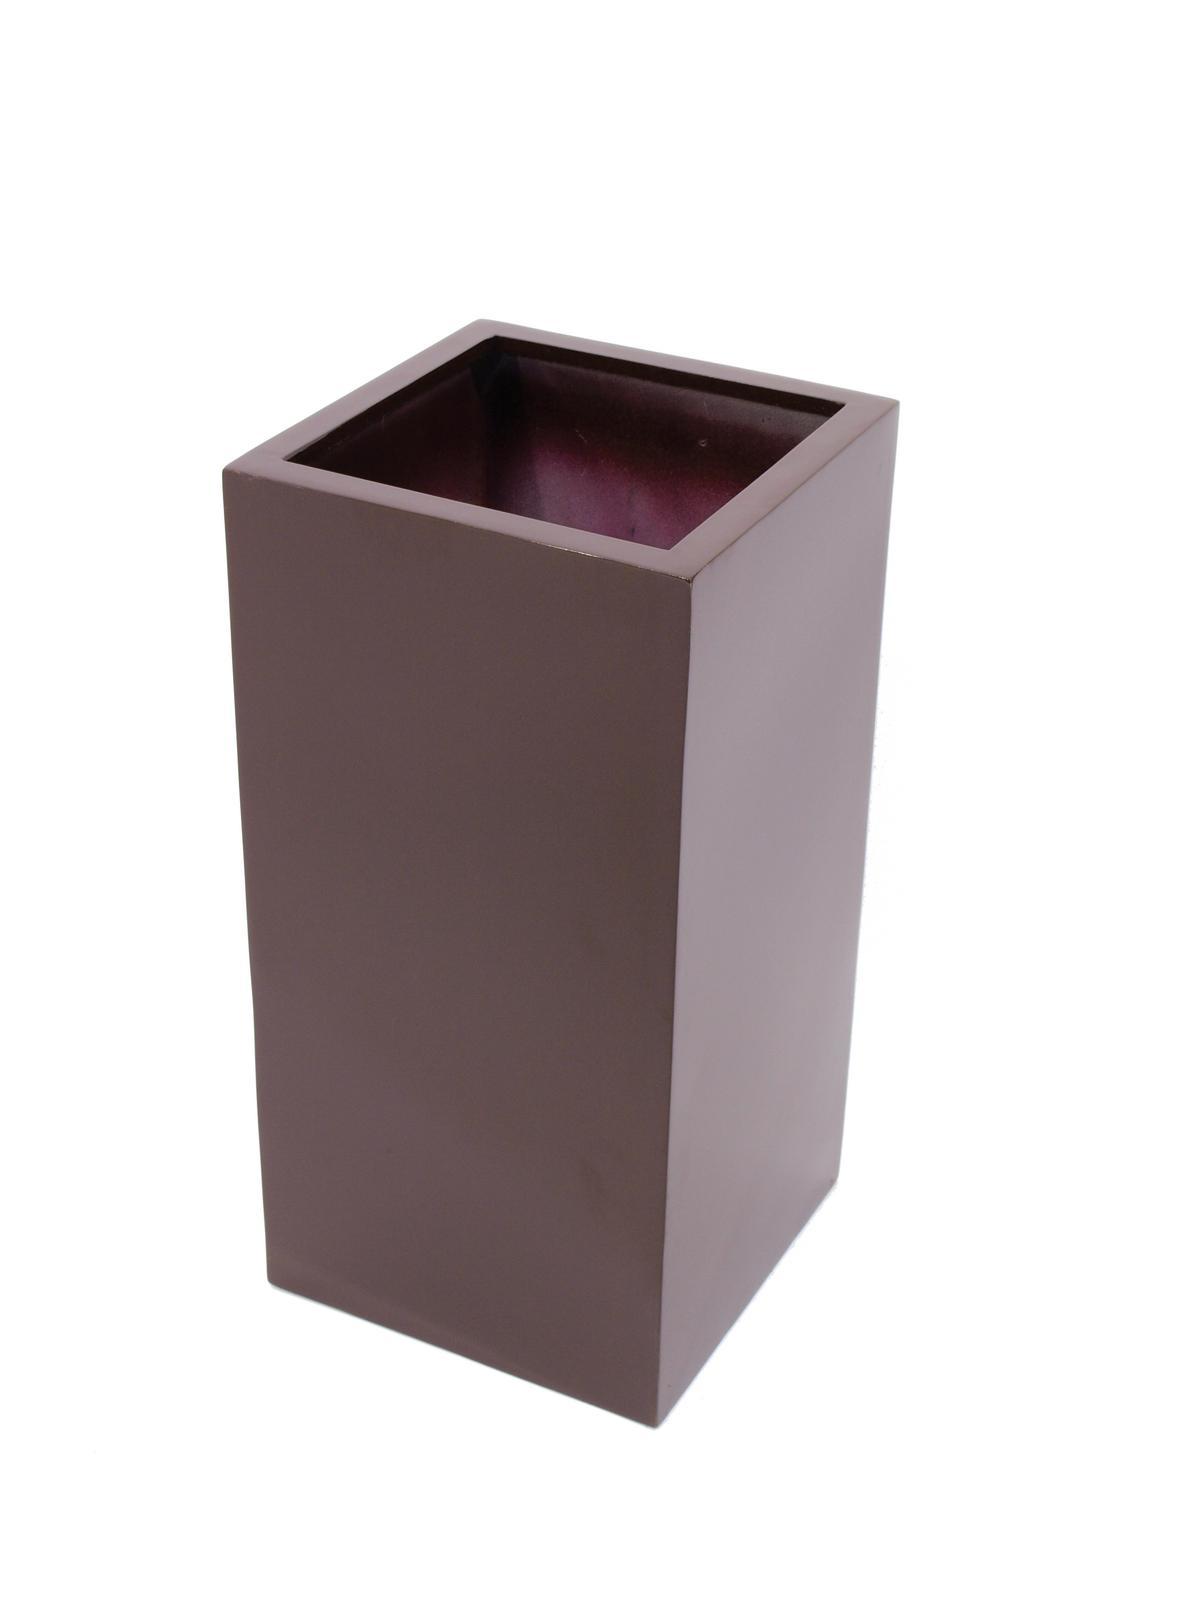 LEICHTSIN BOX-80, lesklý-hnědý